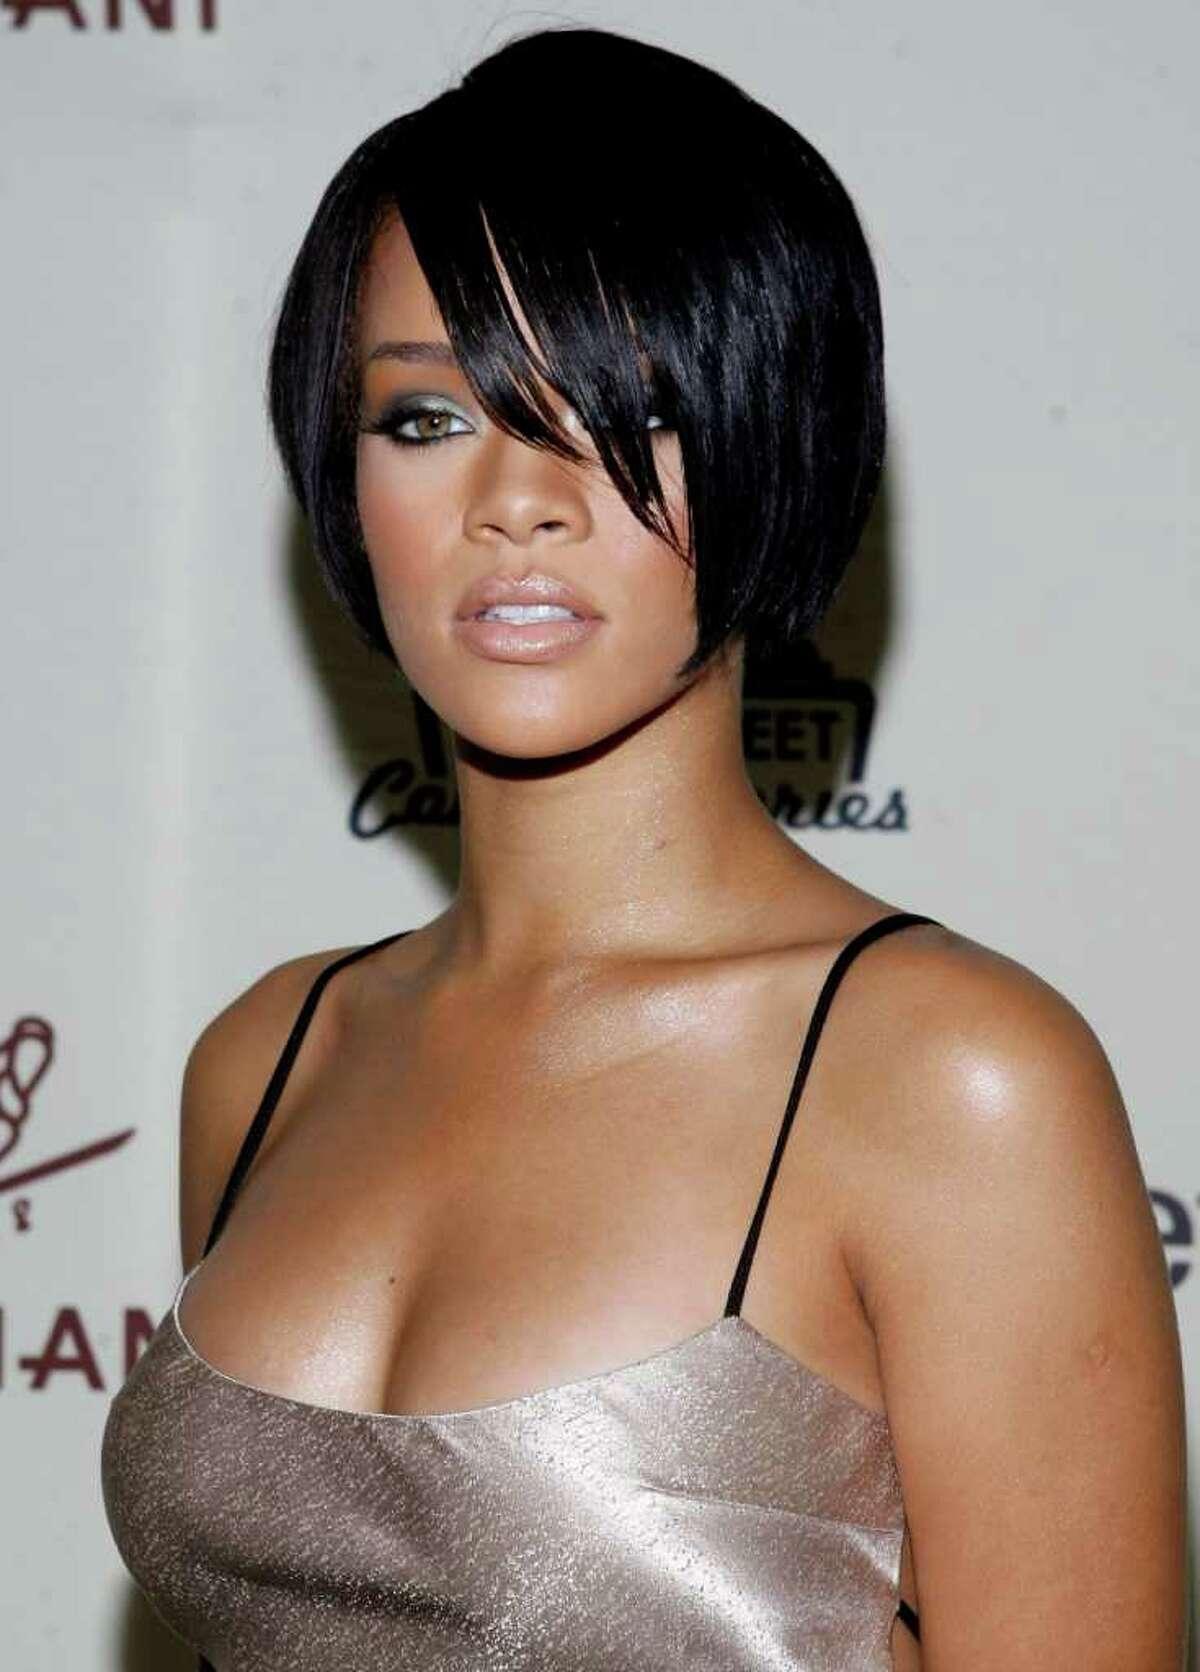 Rihanna Naked Dress, Rihanna Pasties, Rihanna Tom Ford Blog Post